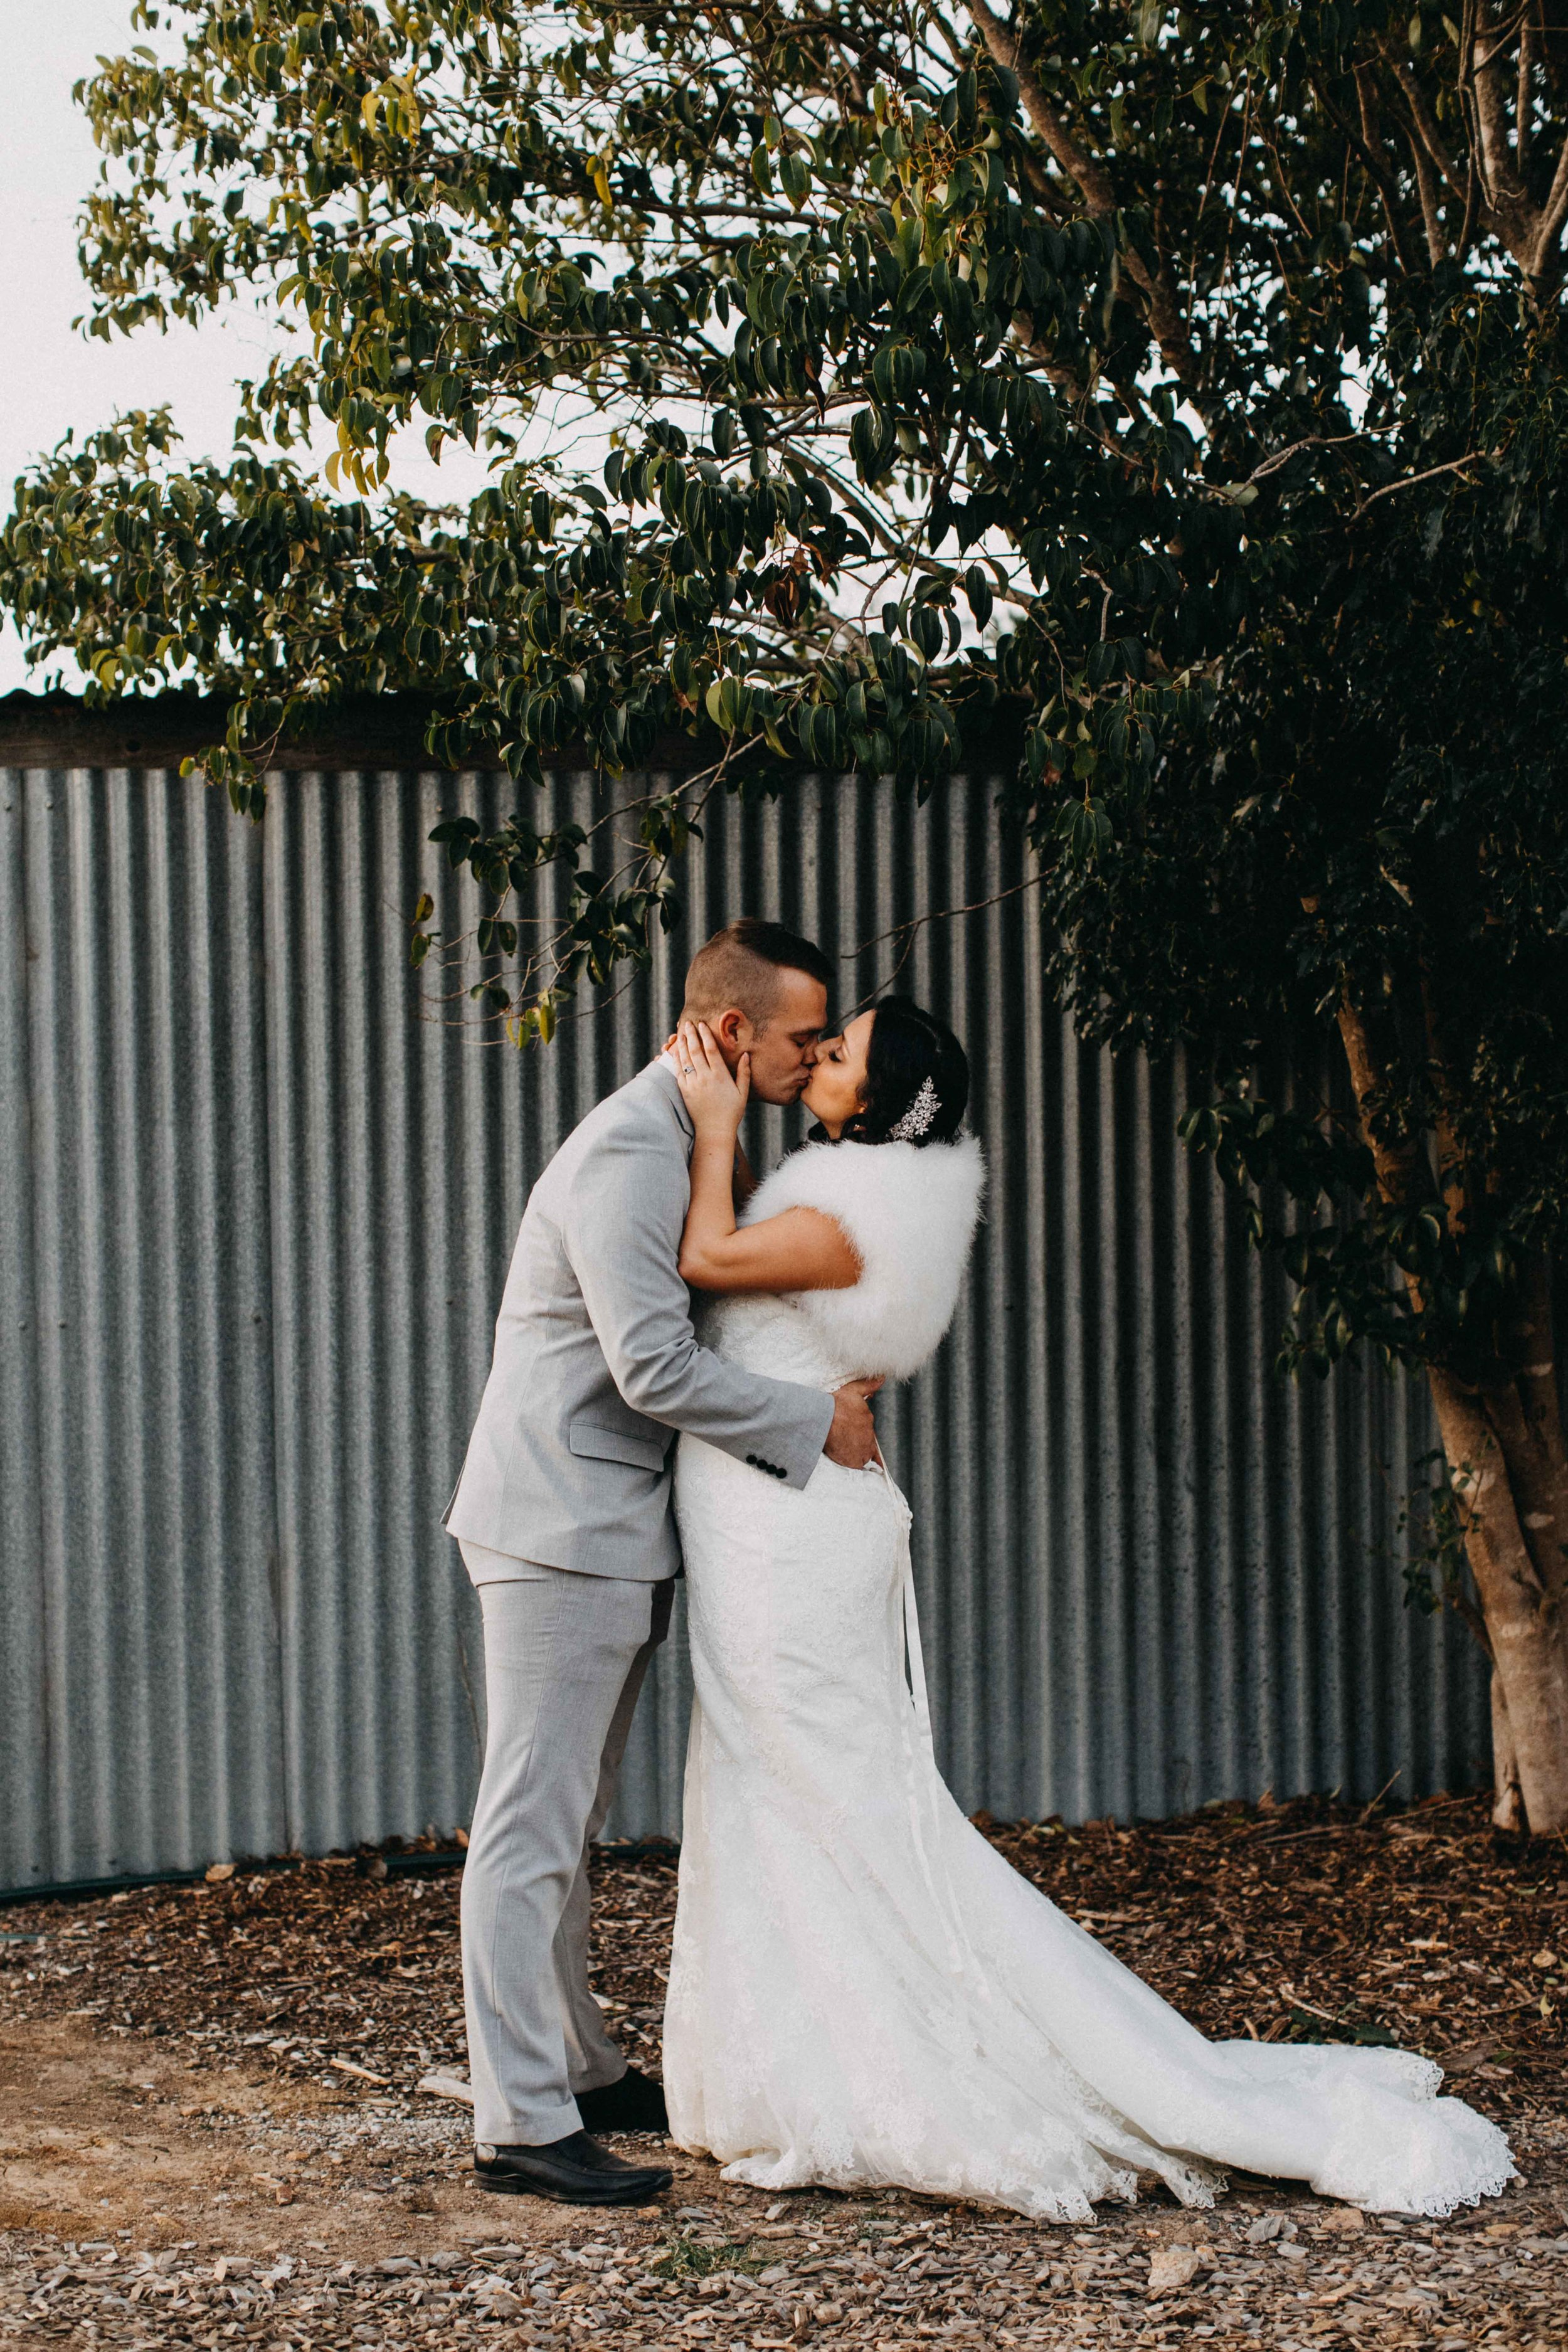 burnham-grove-camden-wedding-emilyobrienphotography-macarthur-140.jpg